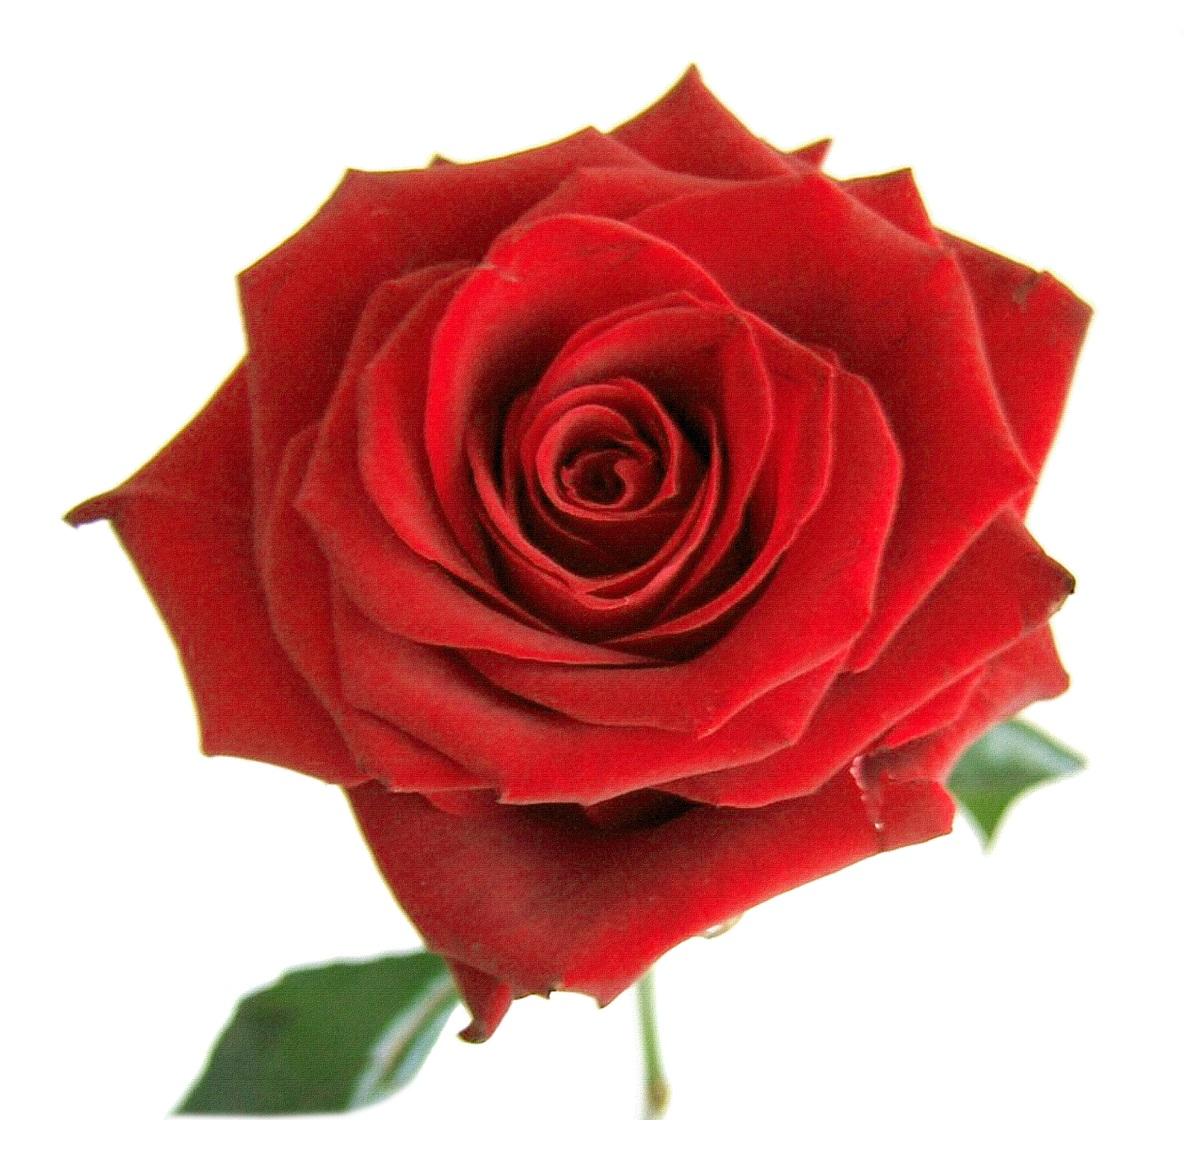 Rosas rosadas png buena resolución